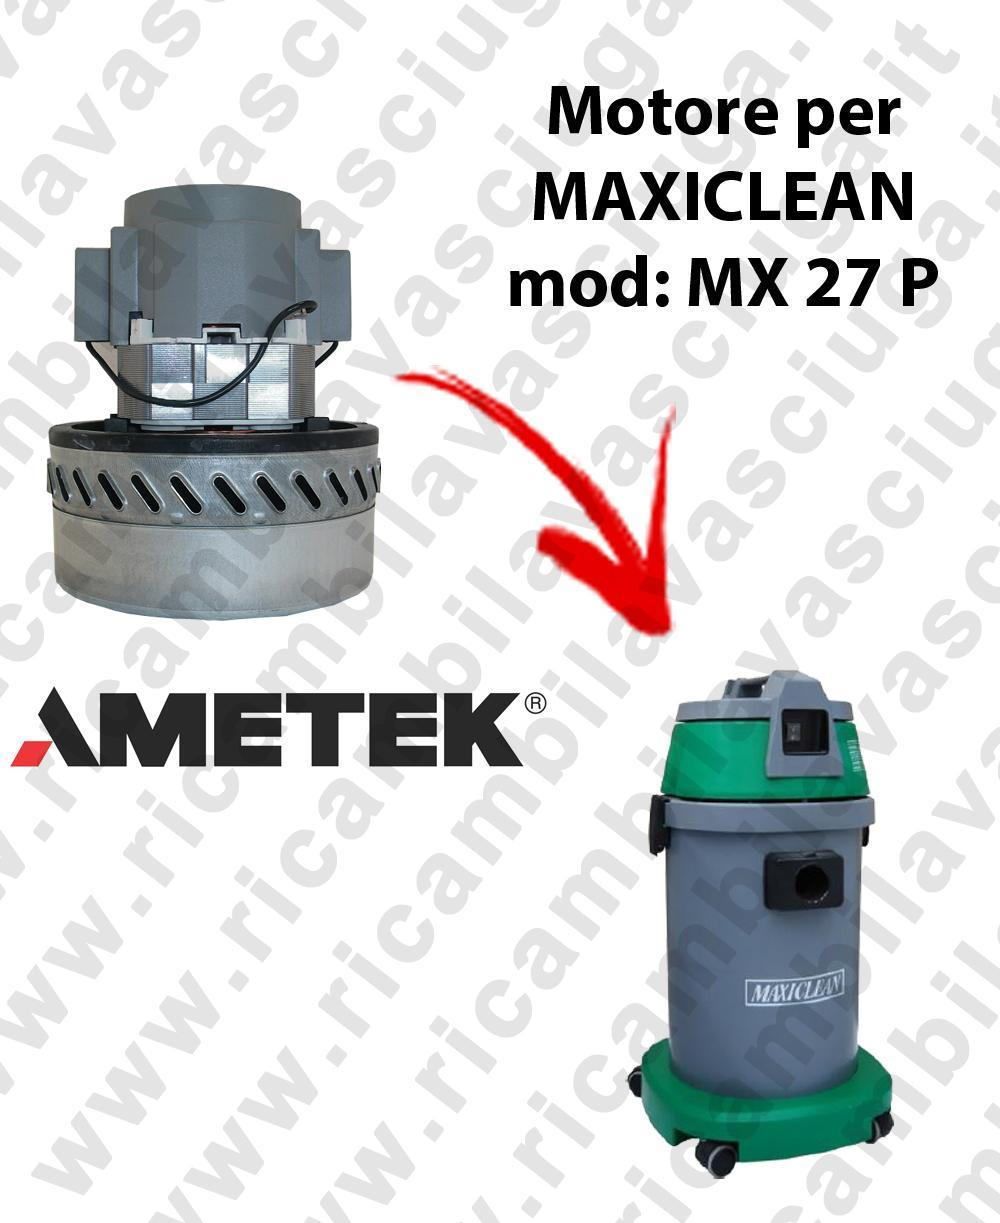 MX 27 P AMETEK vacuum motor for wet and dry vacuum cleaner MAXICLEAN